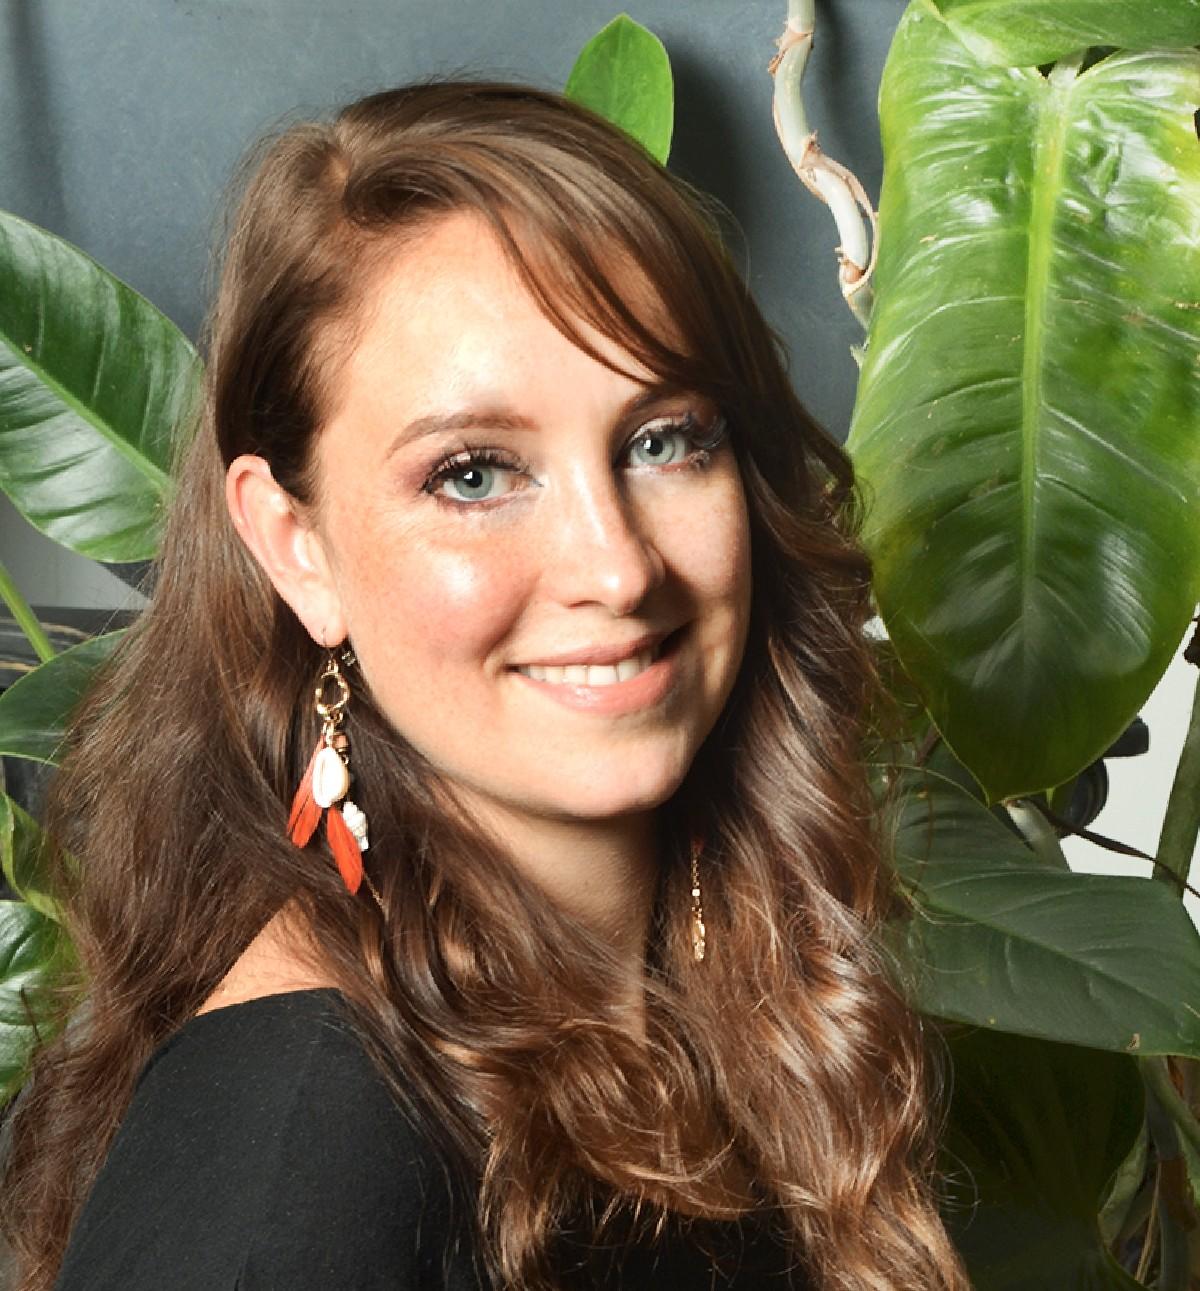 Hadassa Topstylist - Kapper bij Nature Hair Experience Arnhem